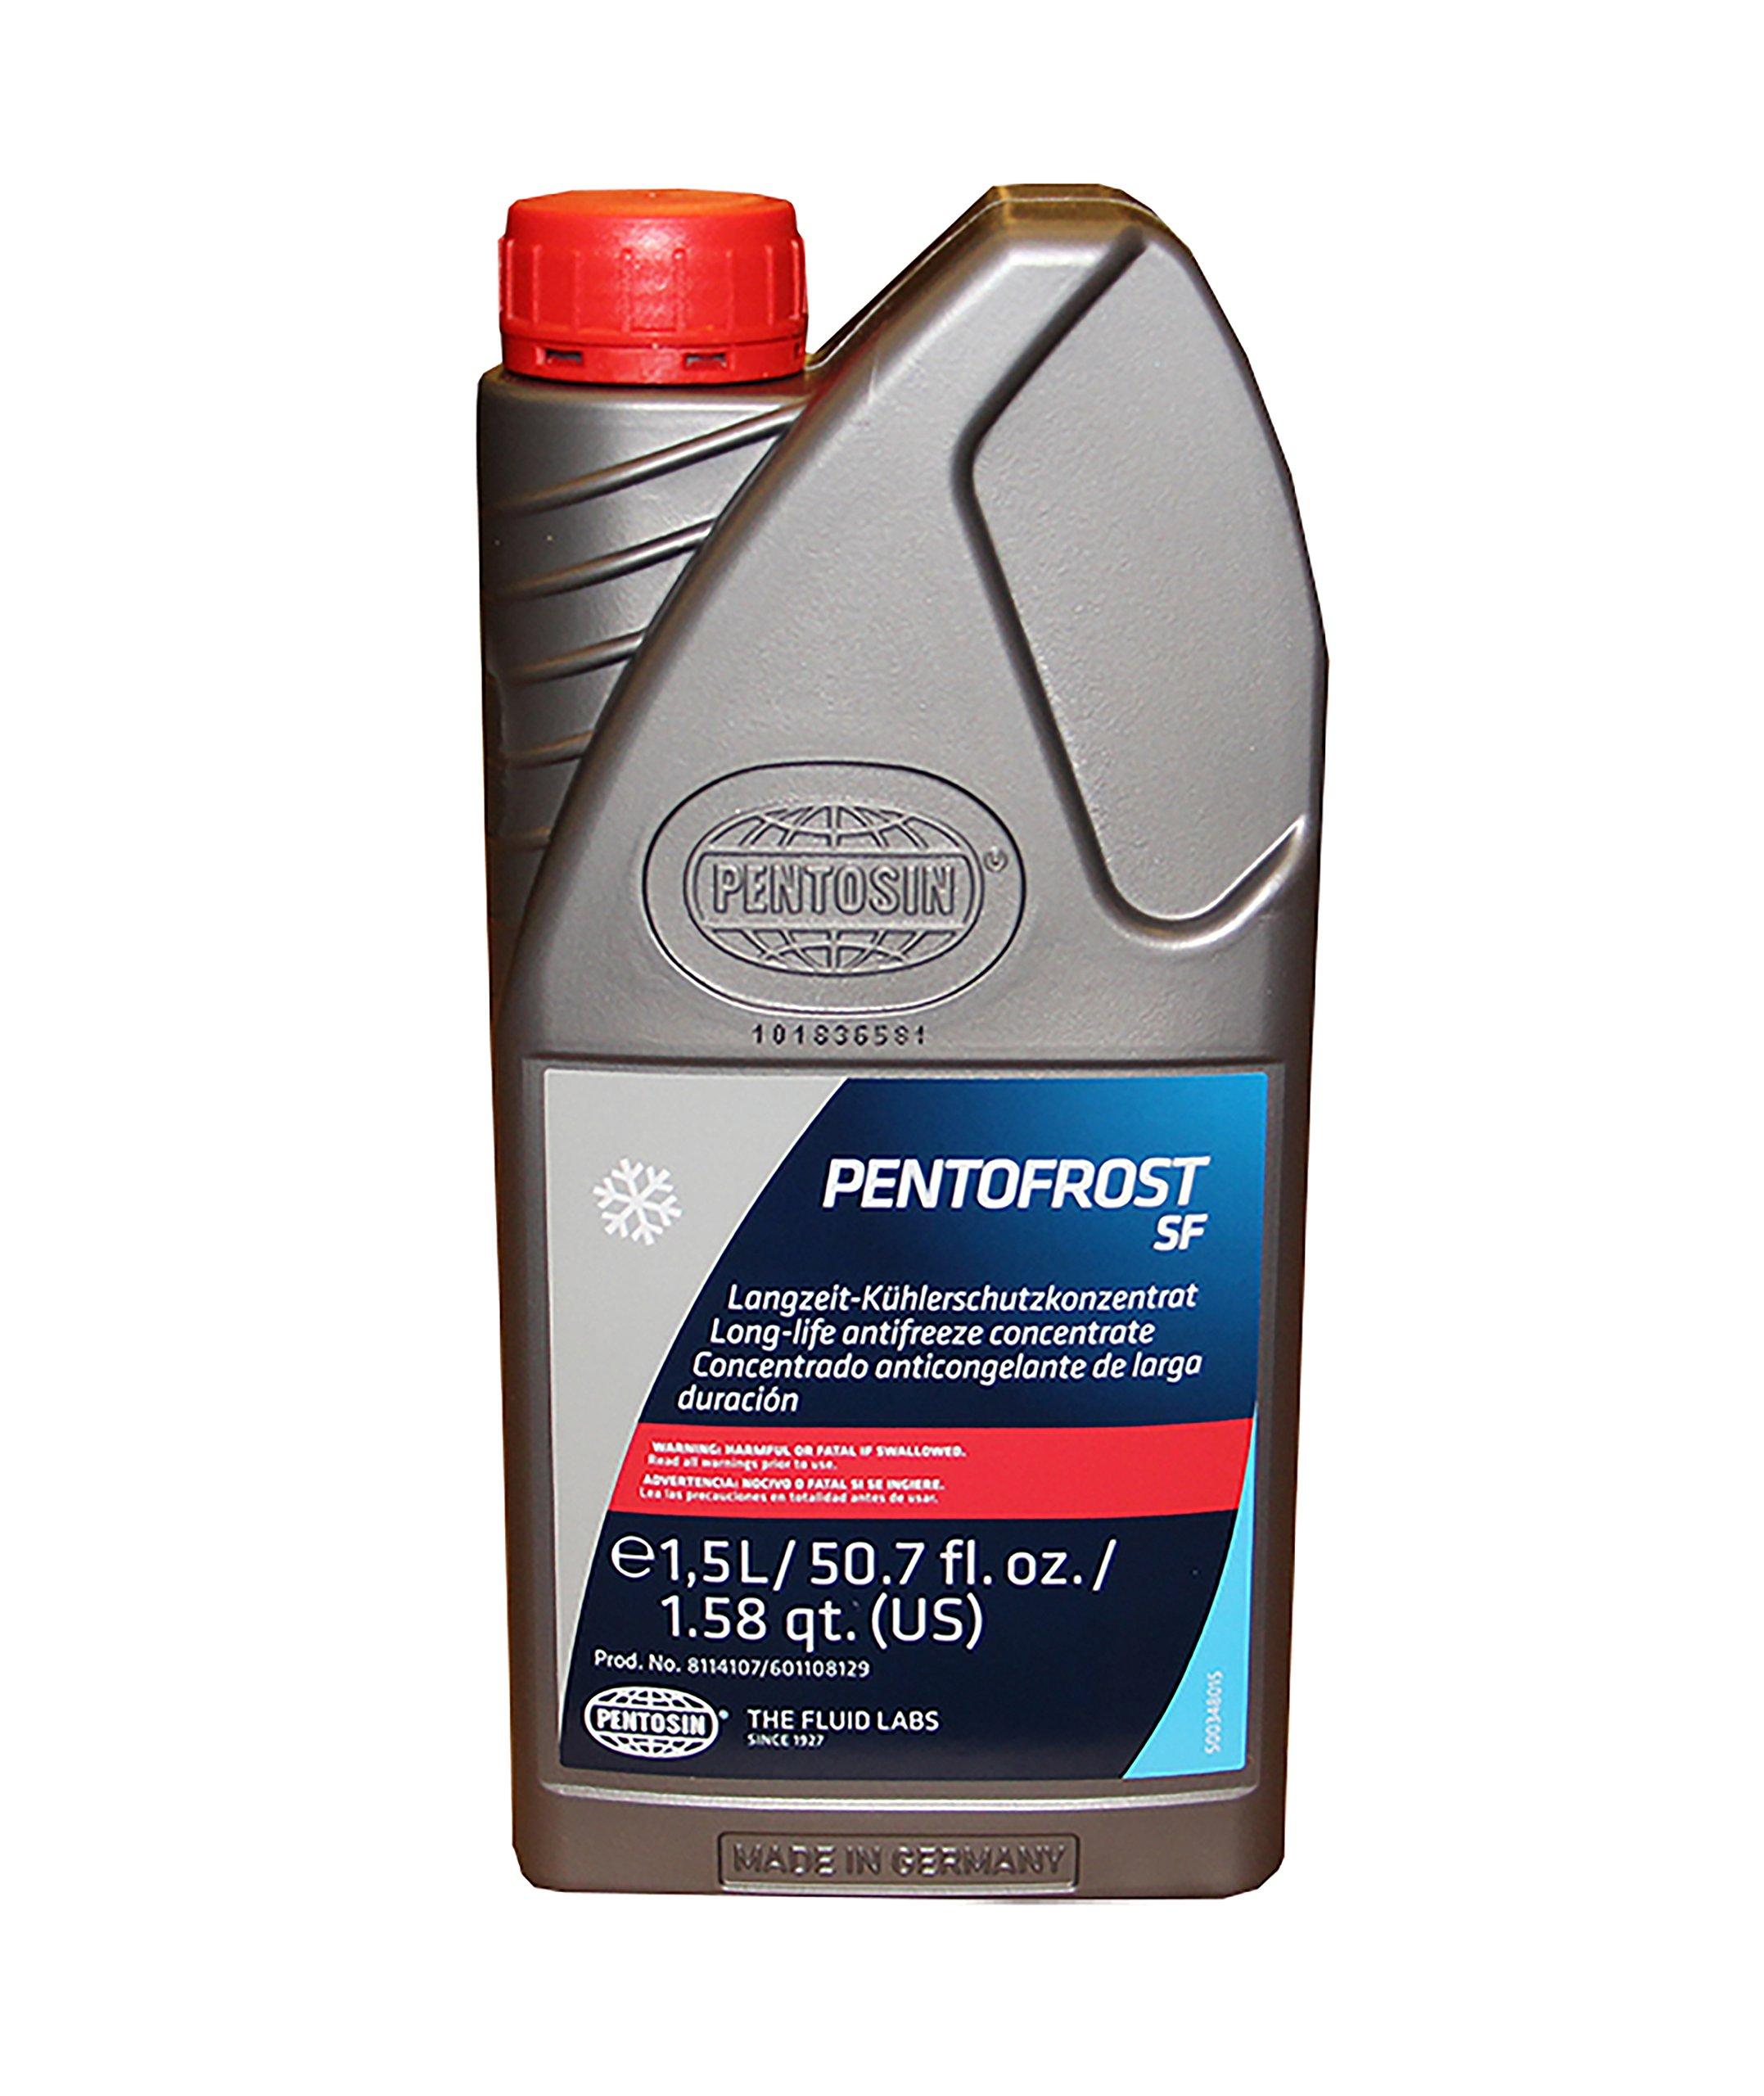 Pentosin 8114107-C Pentofrost SF Silicate Free Antifreeze, 1.5 Liter  (Case of 12)